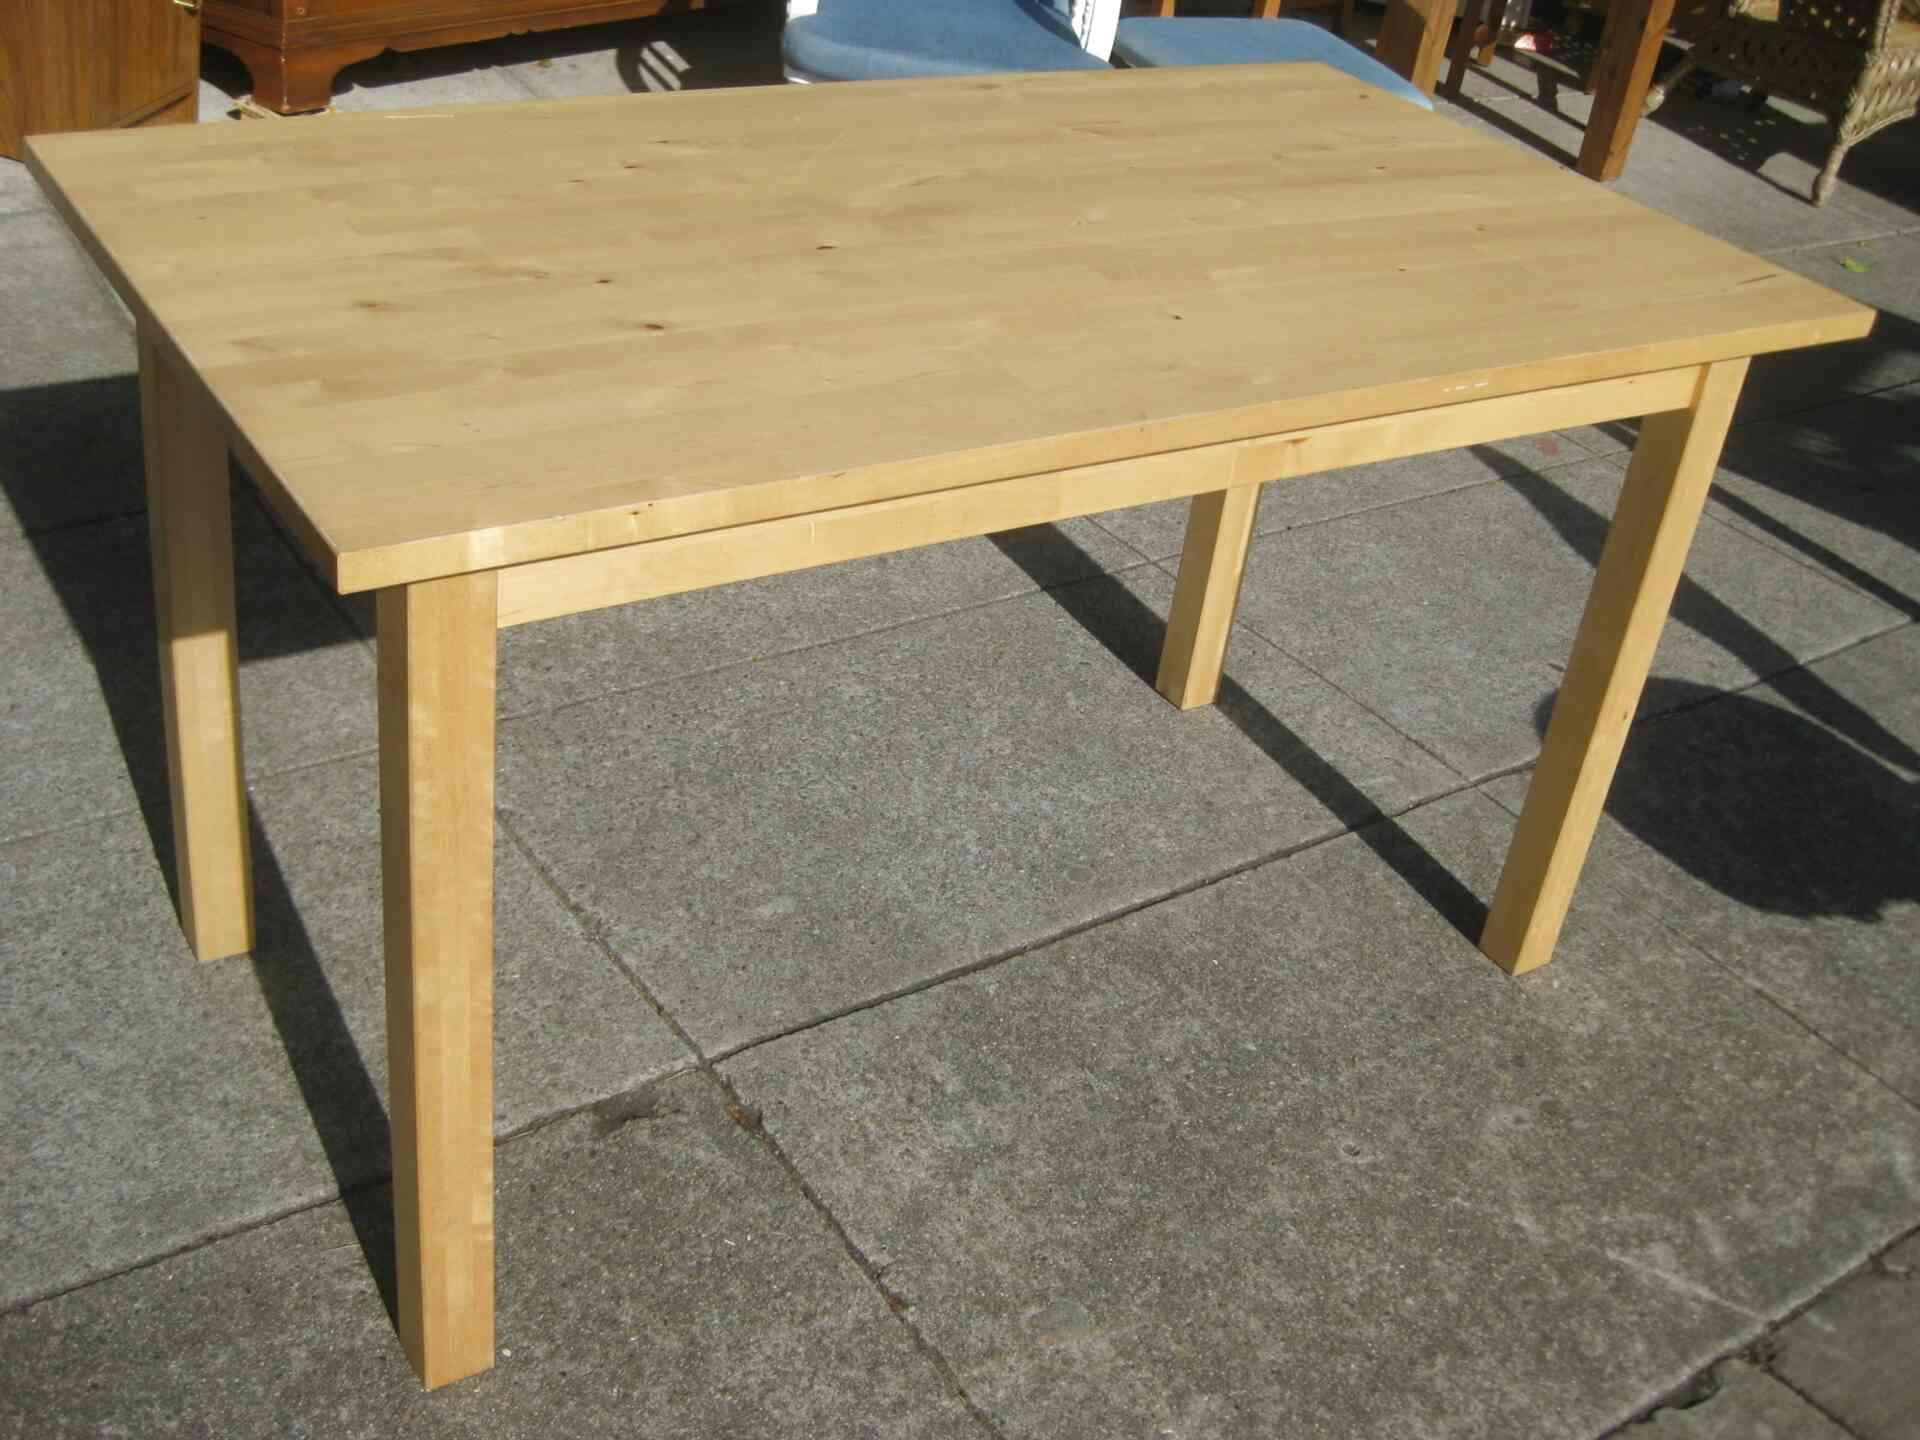 Table Norden Ikea D Occasion Plus Que 4 A 75